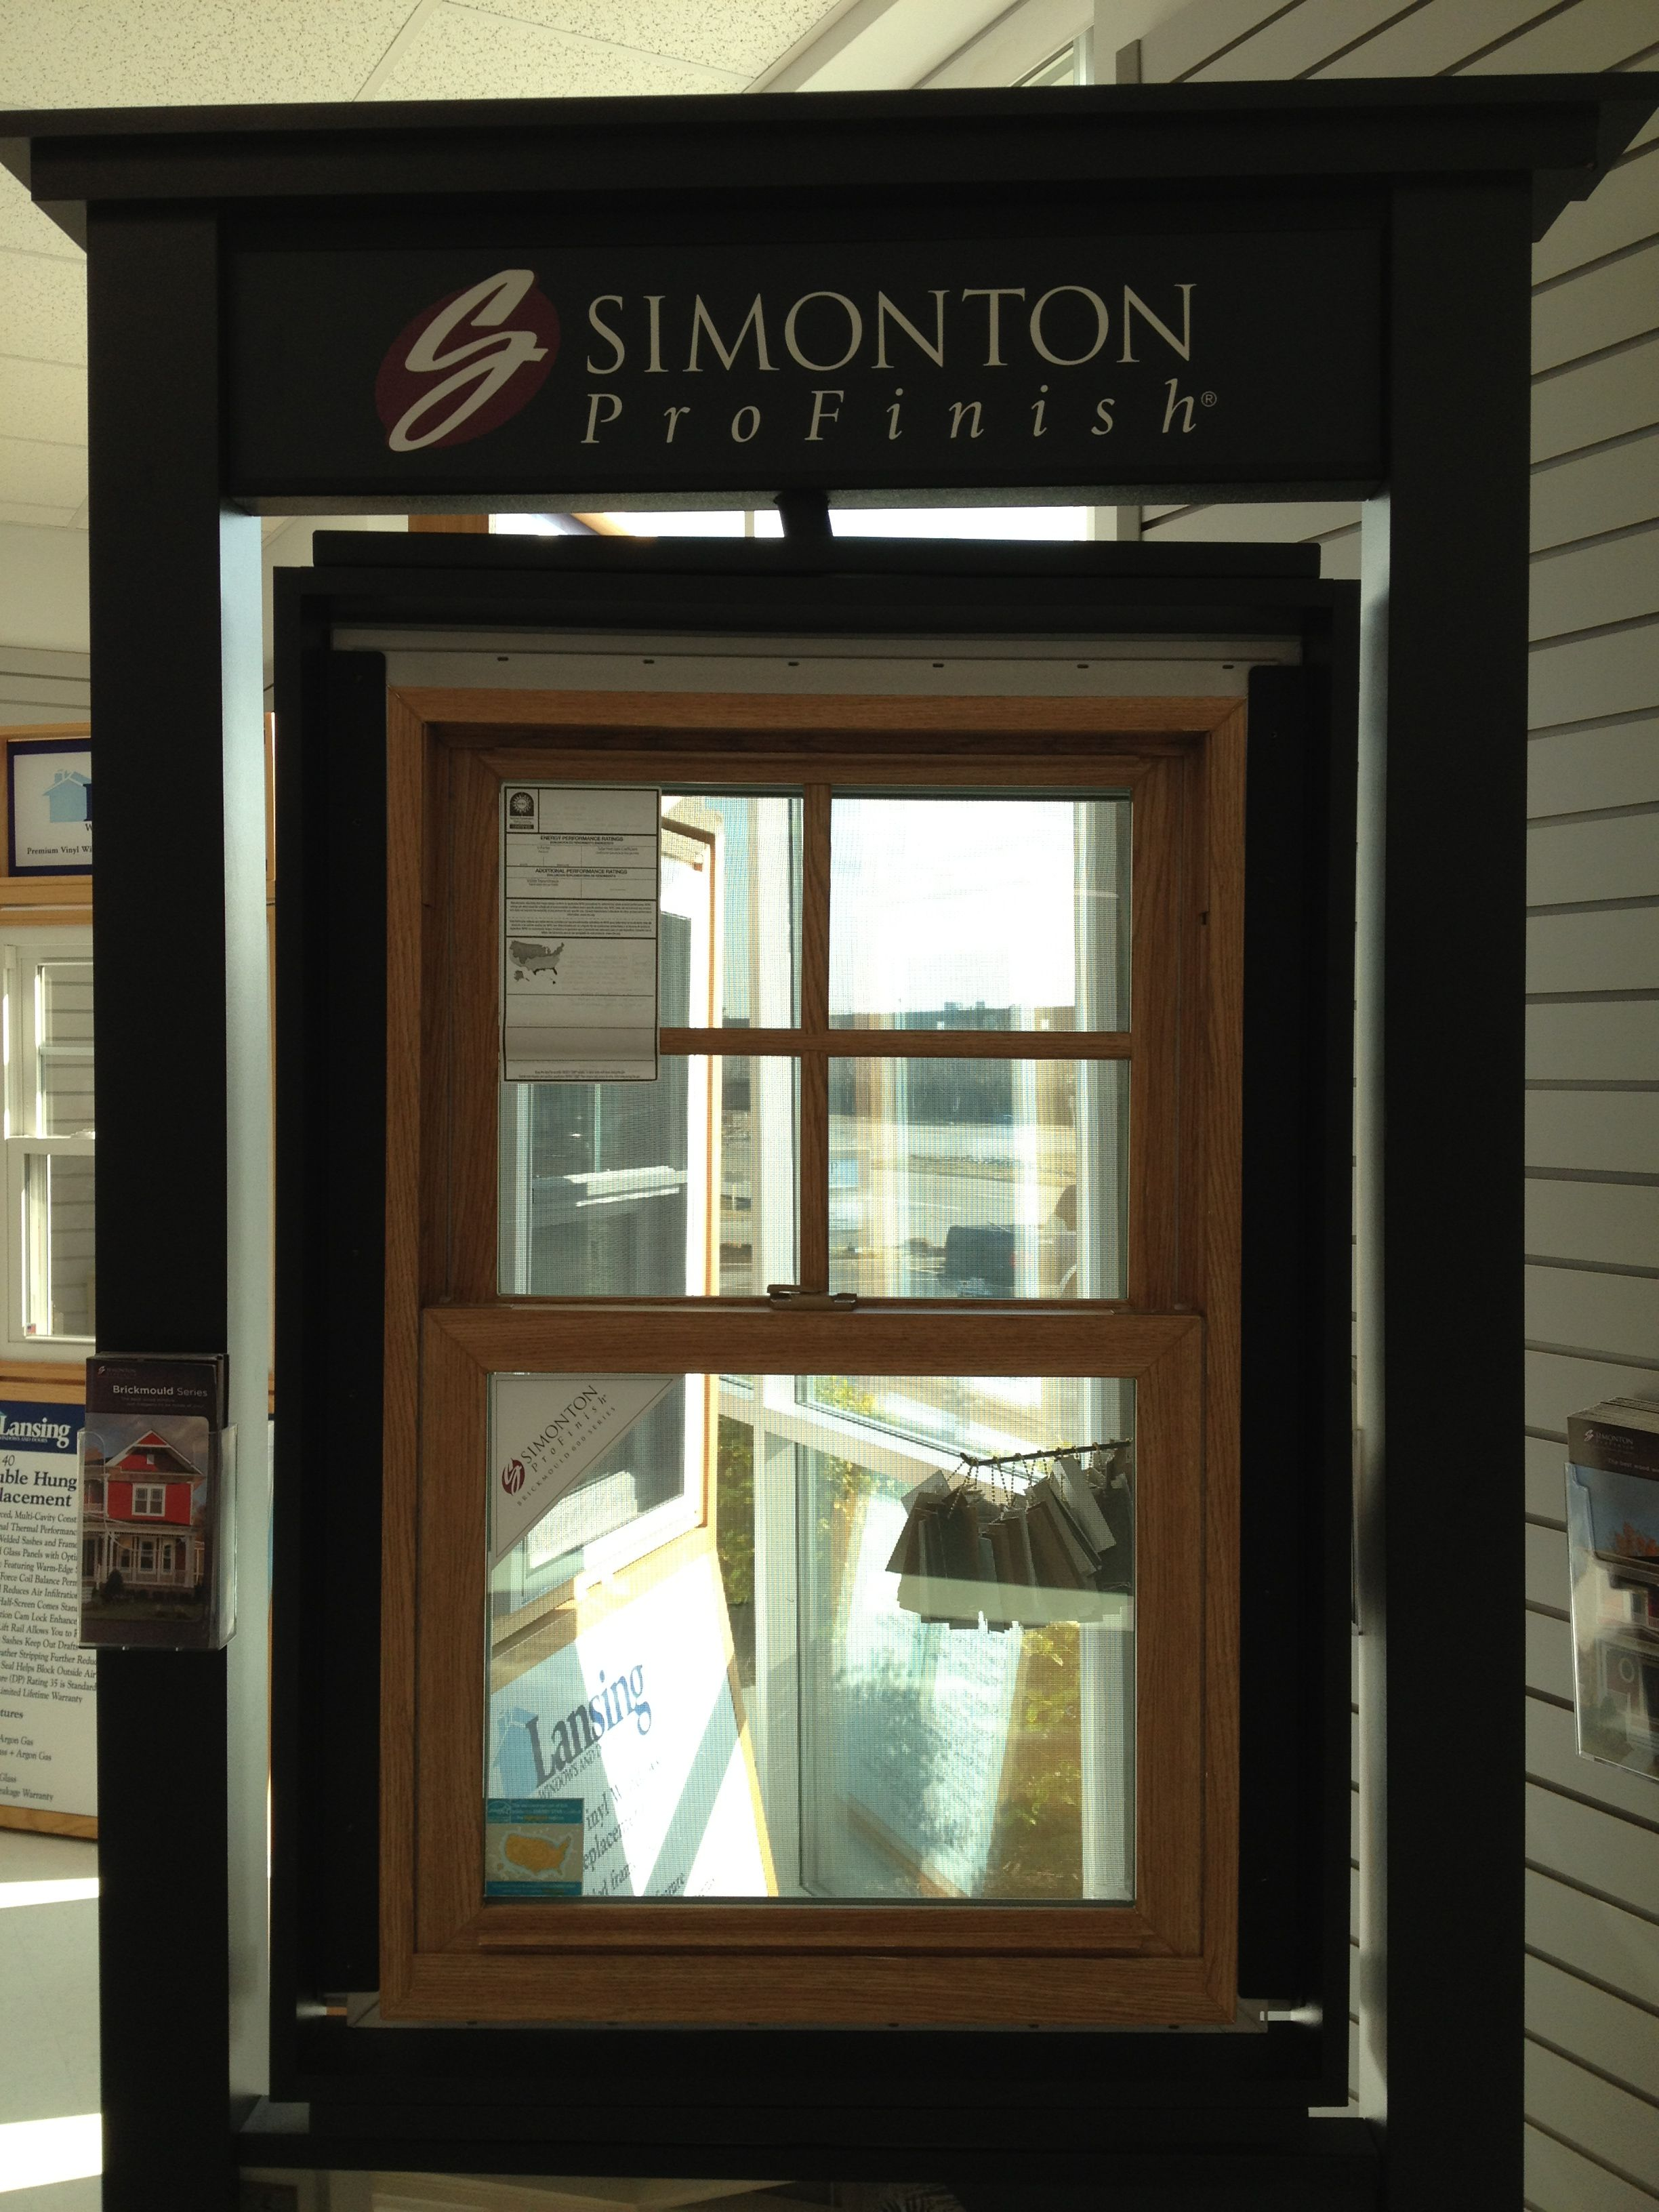 Simonton Profinish Double Hung With Oak Grain Wood Interior On Vinyl Window Window Vinyl Windows Wood Interiors